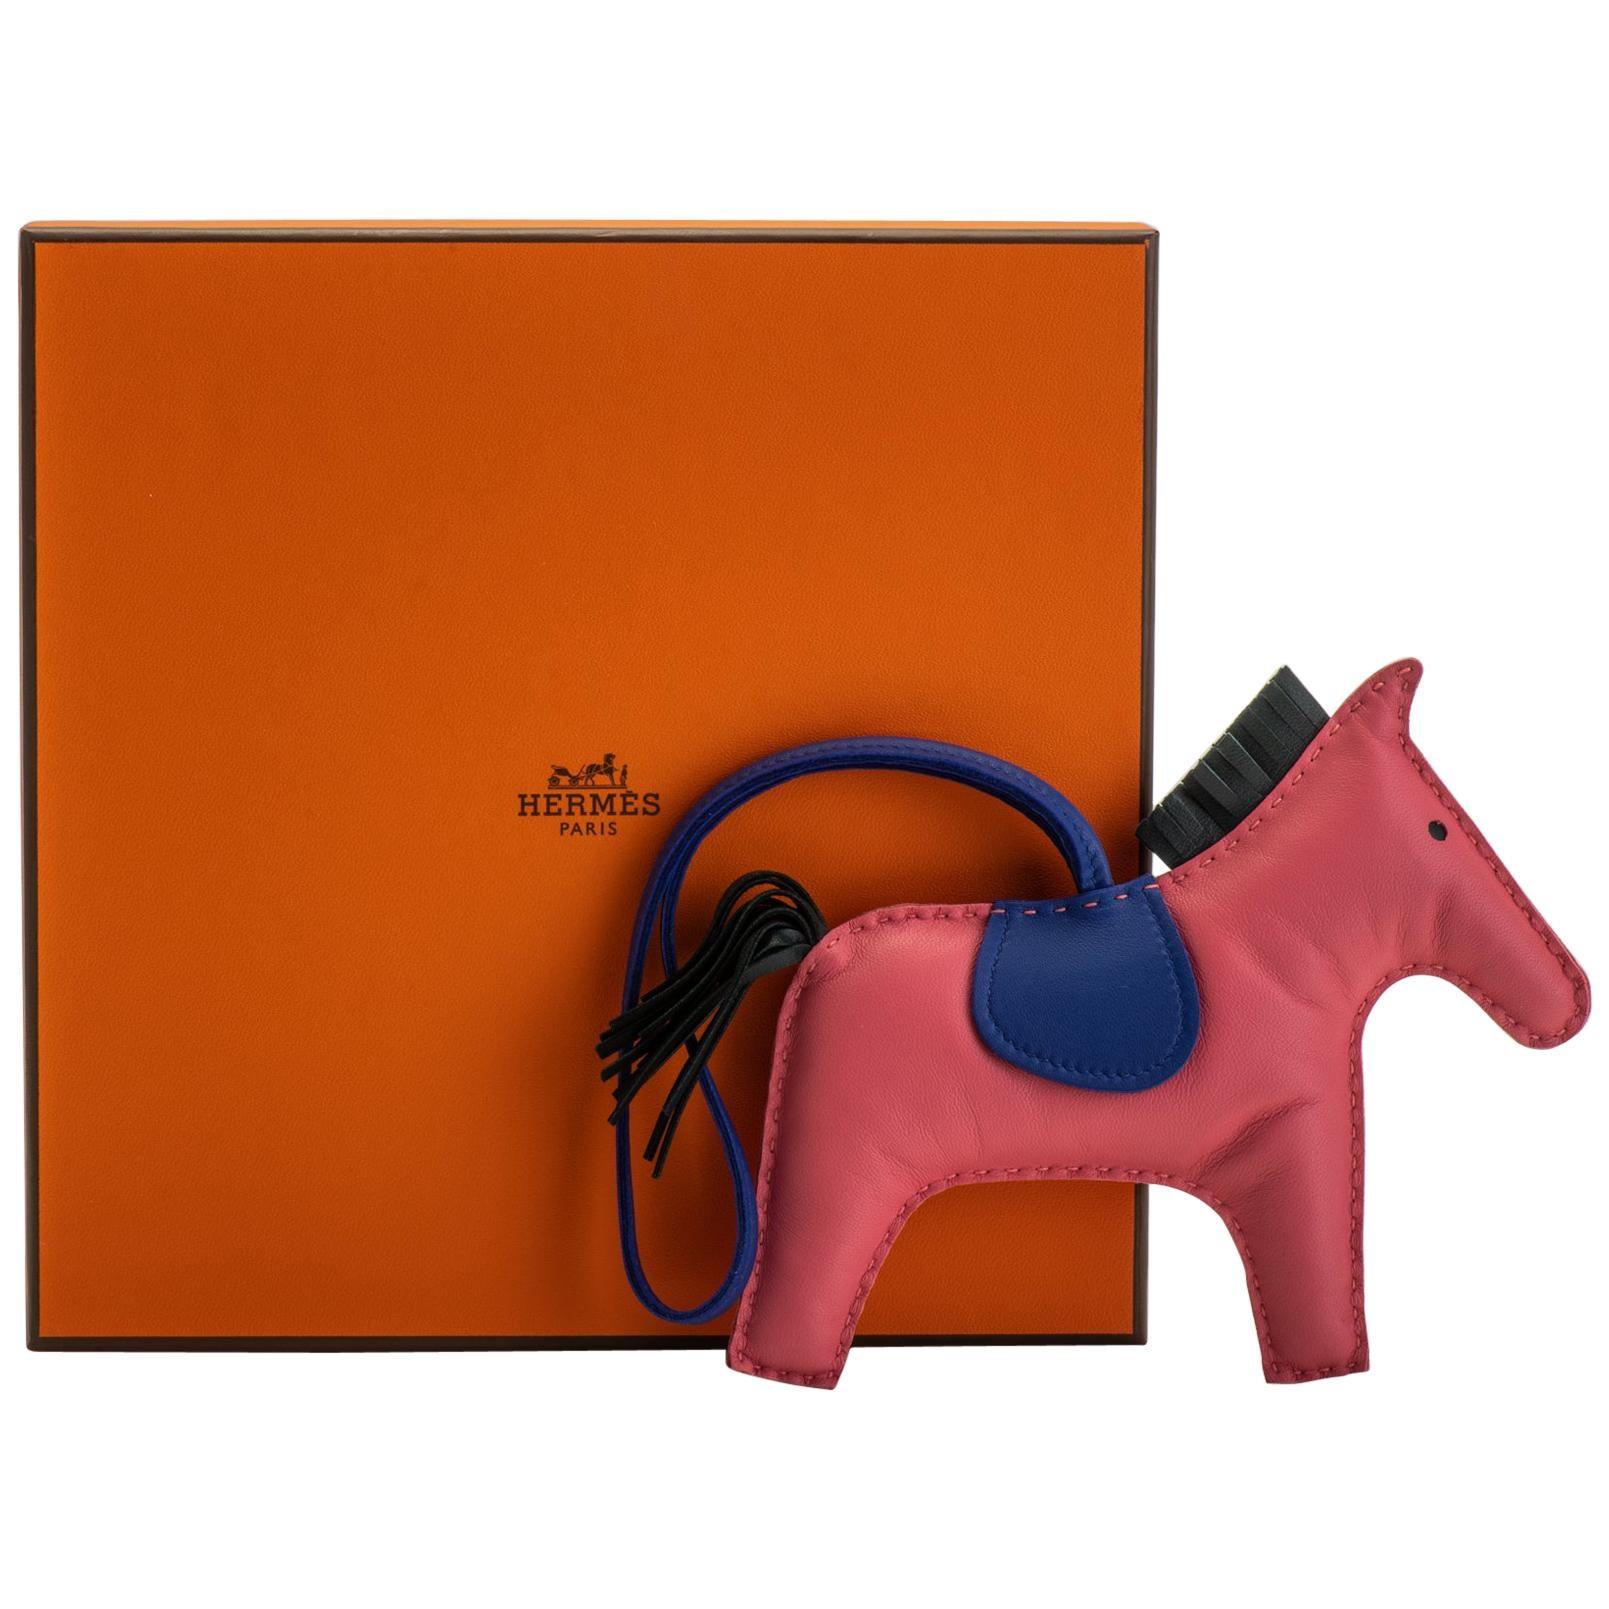 New in Box Hermes Rodeo PM Rose Azalee Bag Charm